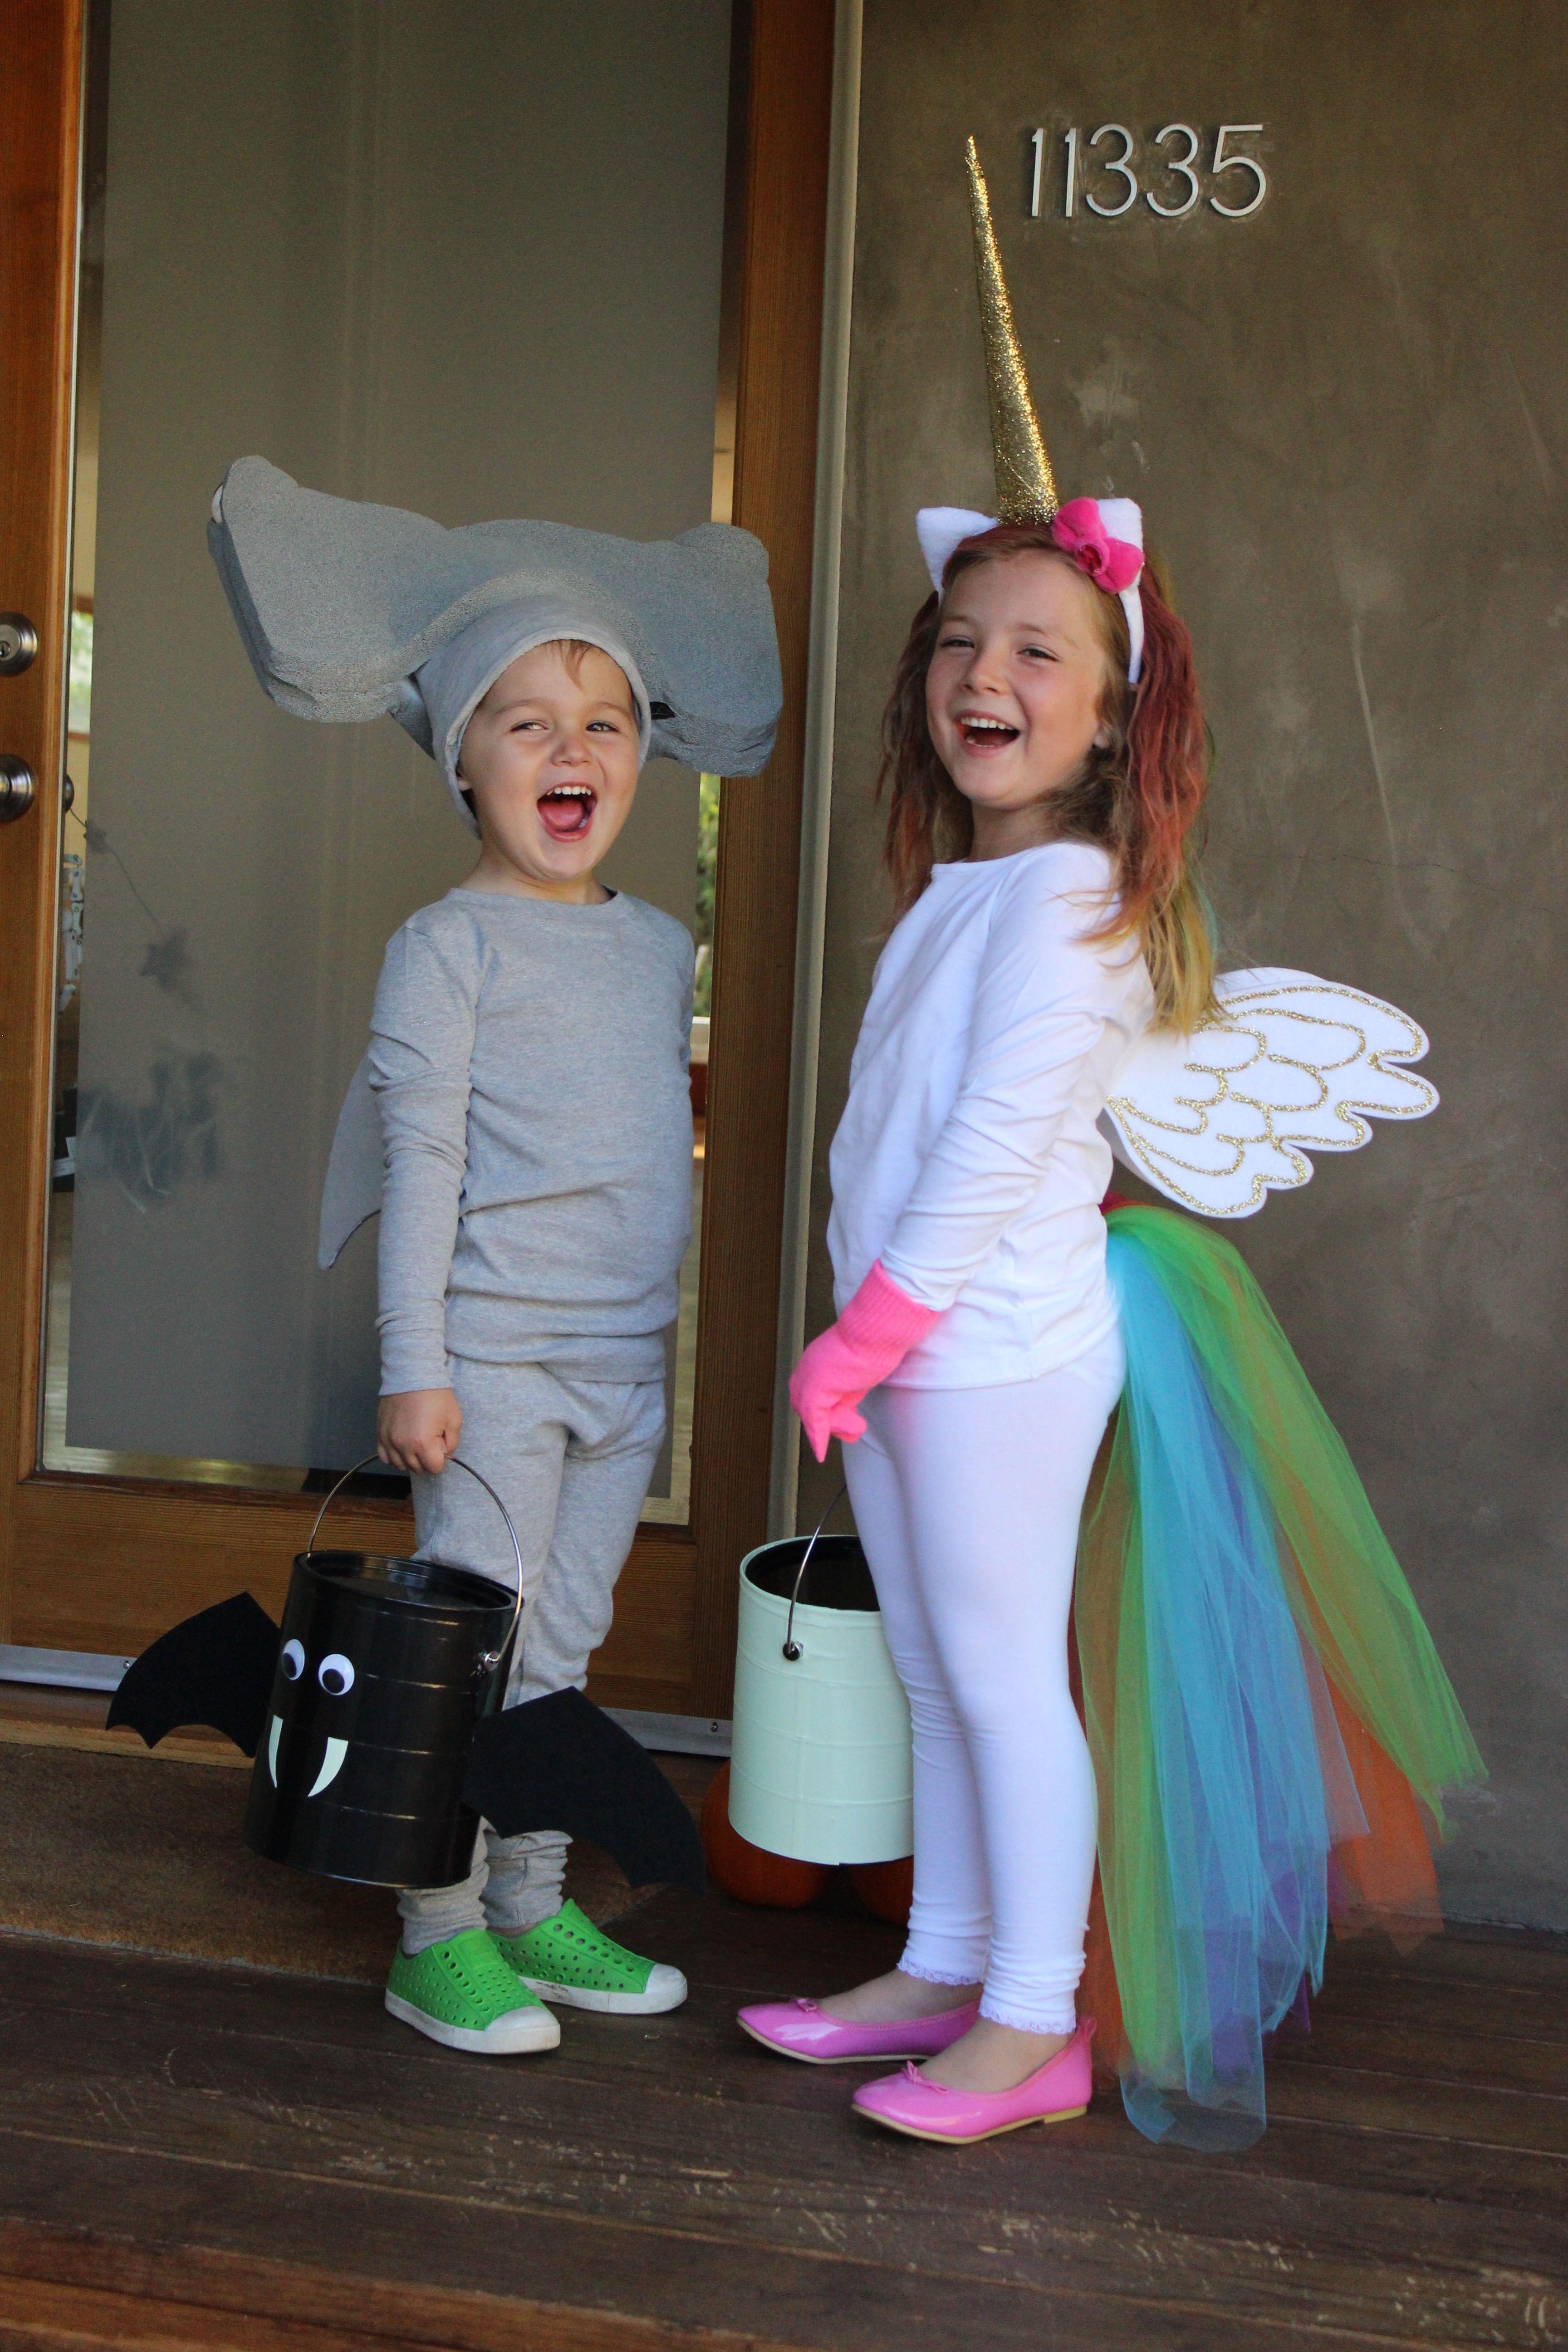 ff5e2c6a janecanblogdotcom.files.wordpress.com 2015 10 hallowee-costume2.jpg Diy  Shark